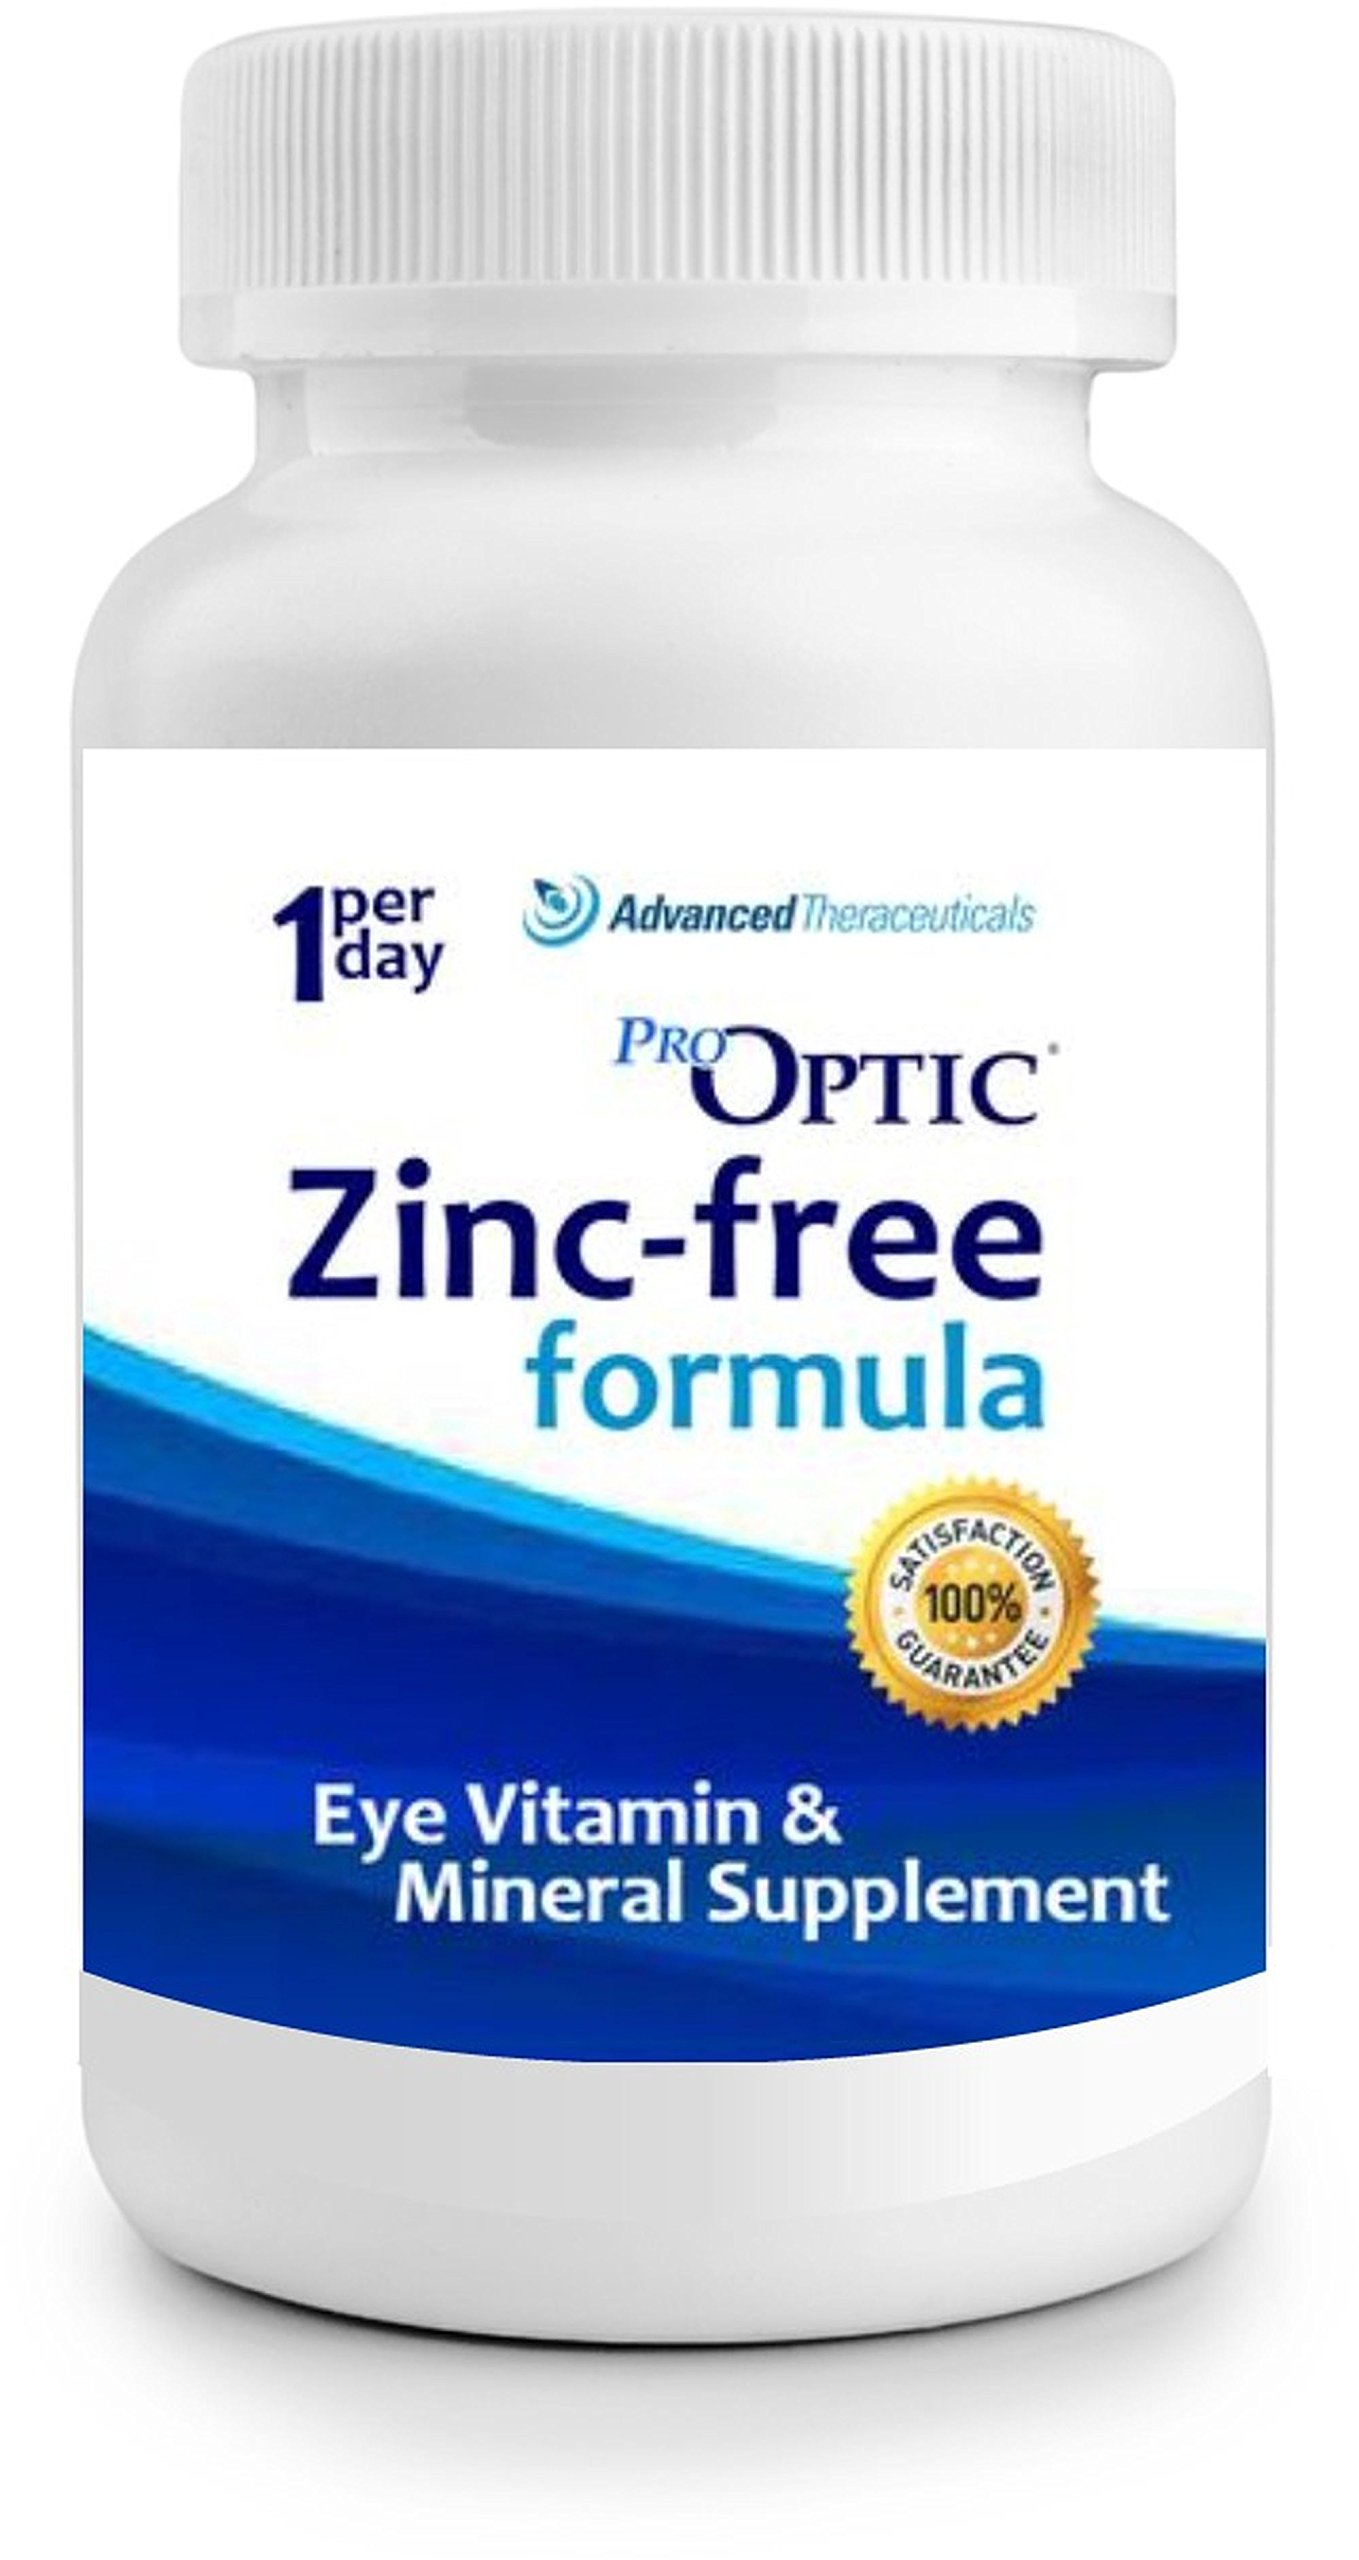 Pro-Optic AREDS 2 (ZINC-FREE) Formula (3 Month Supply) 1-Per-Day/Veggie Caps